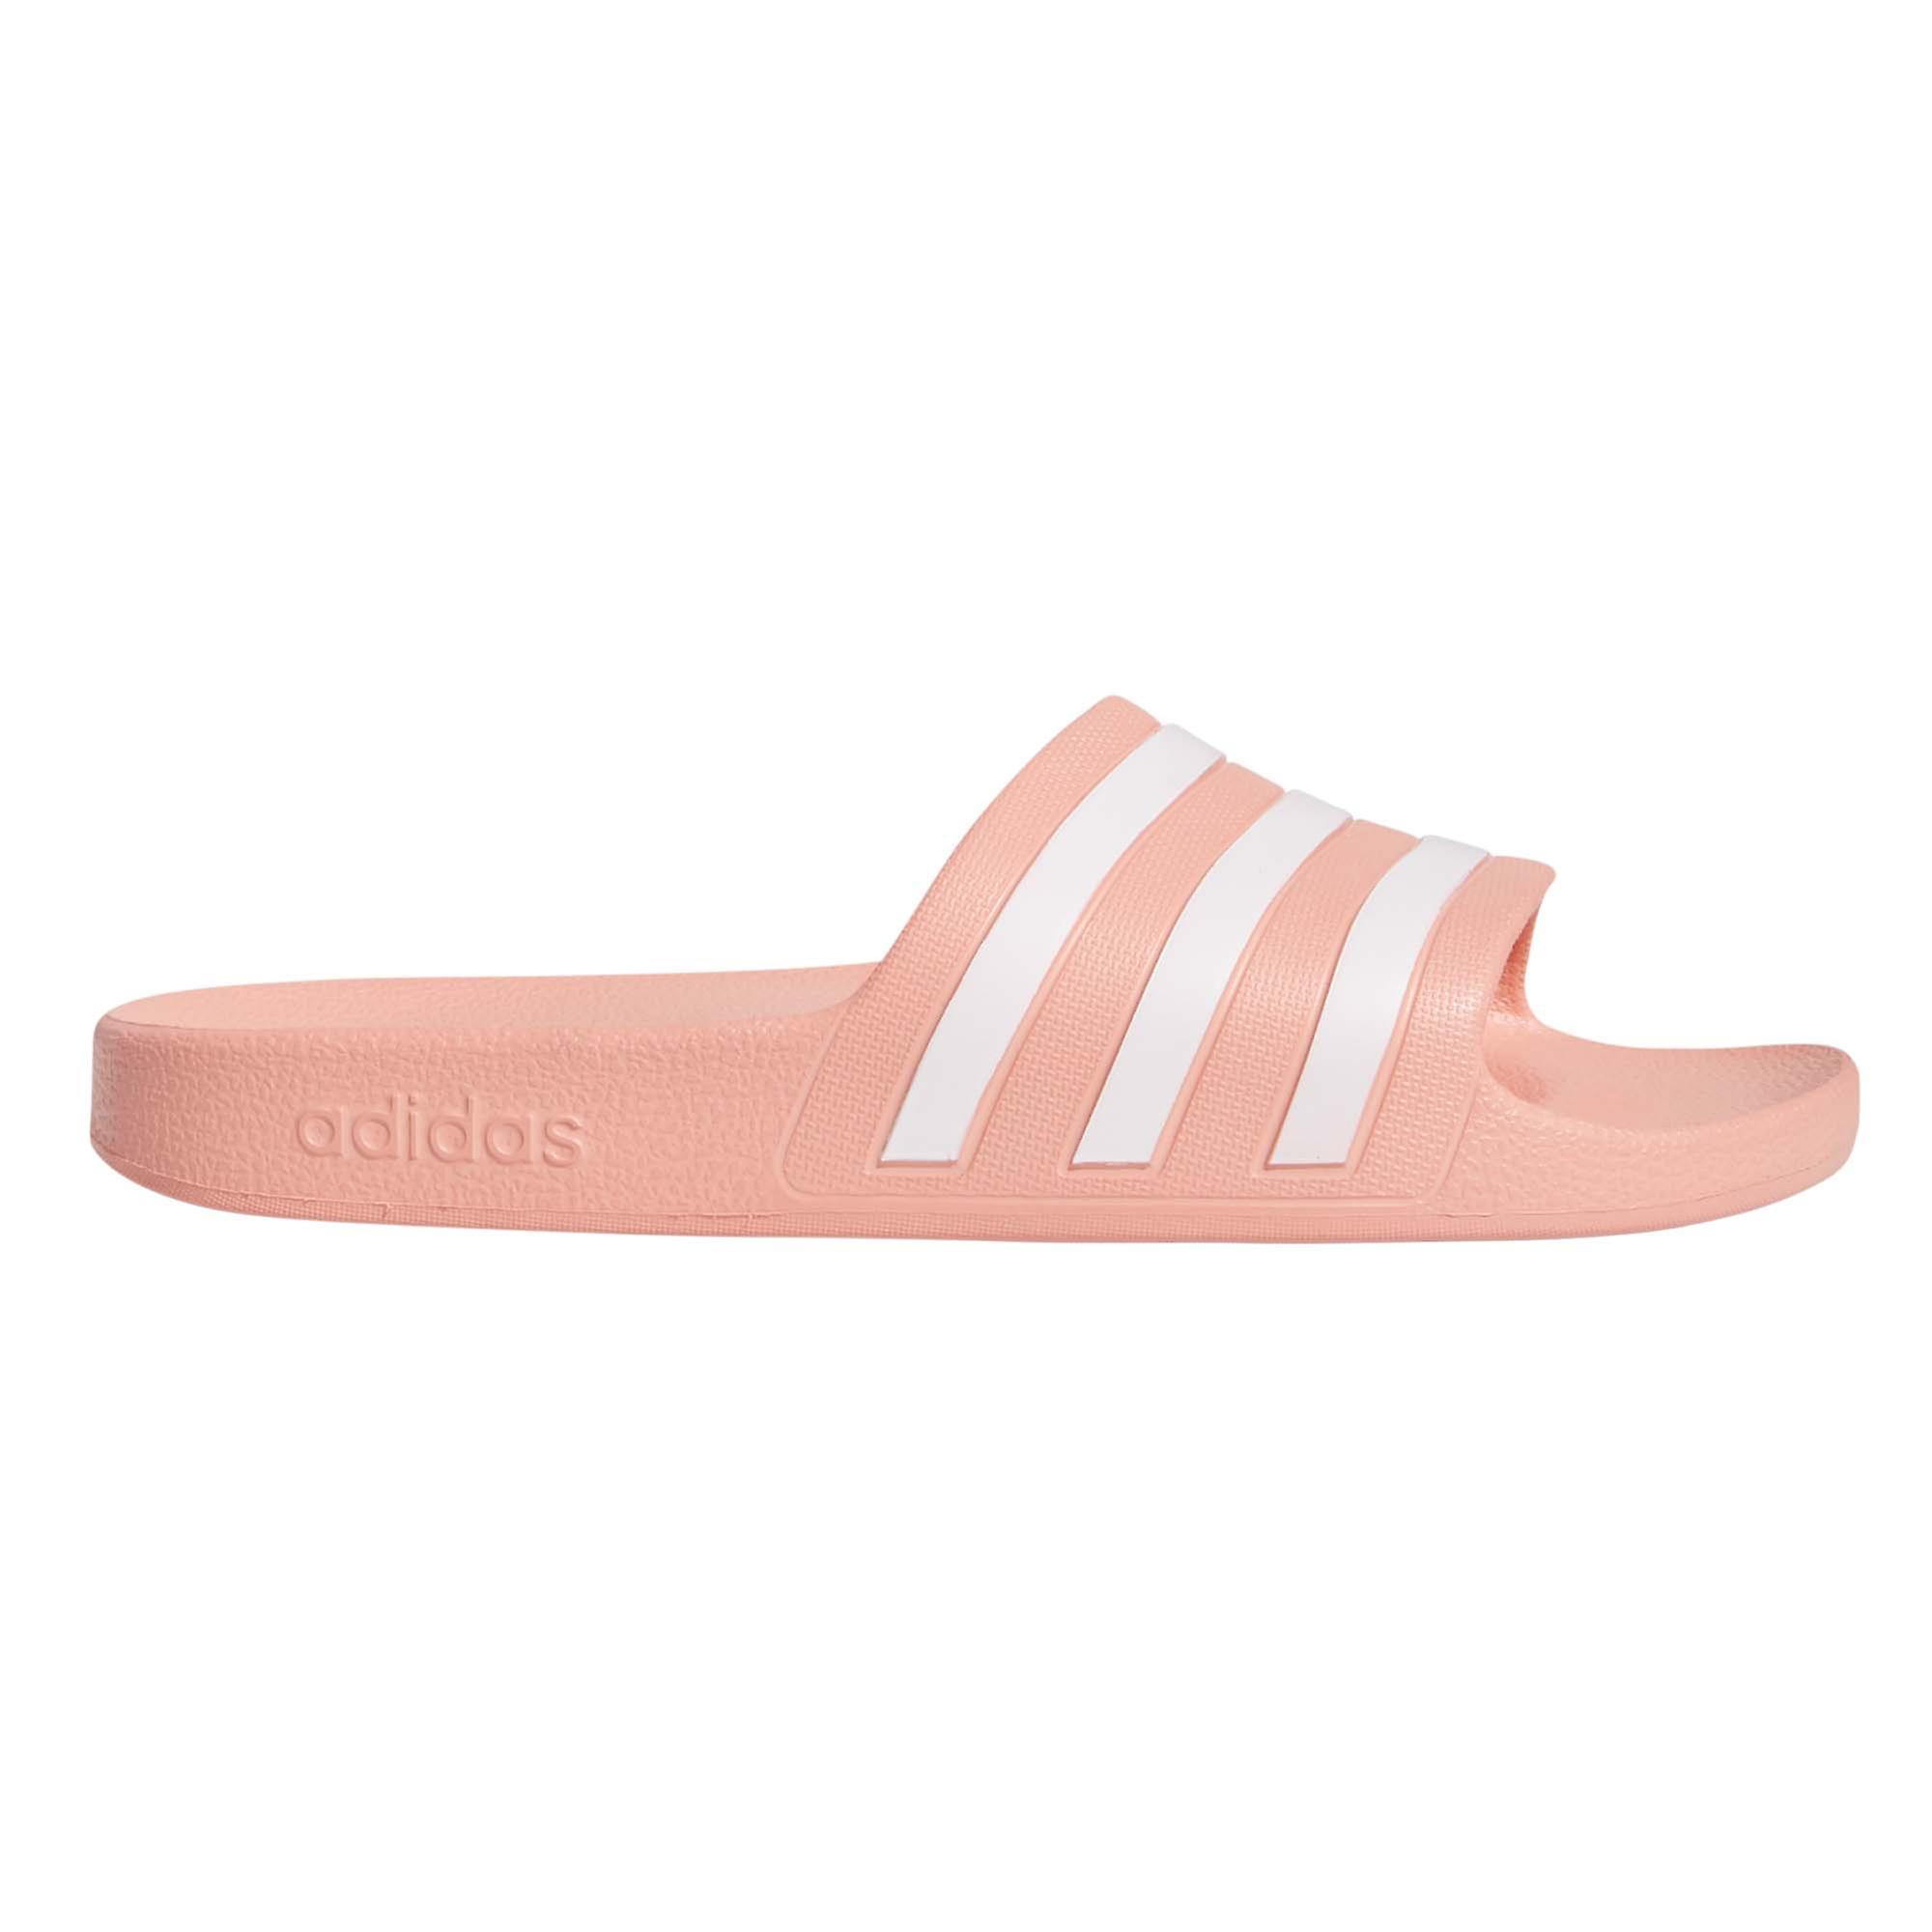 adidas Adilette Aqua Womens Pool Flip Flop Slide Sandal Pink/White VHfsj